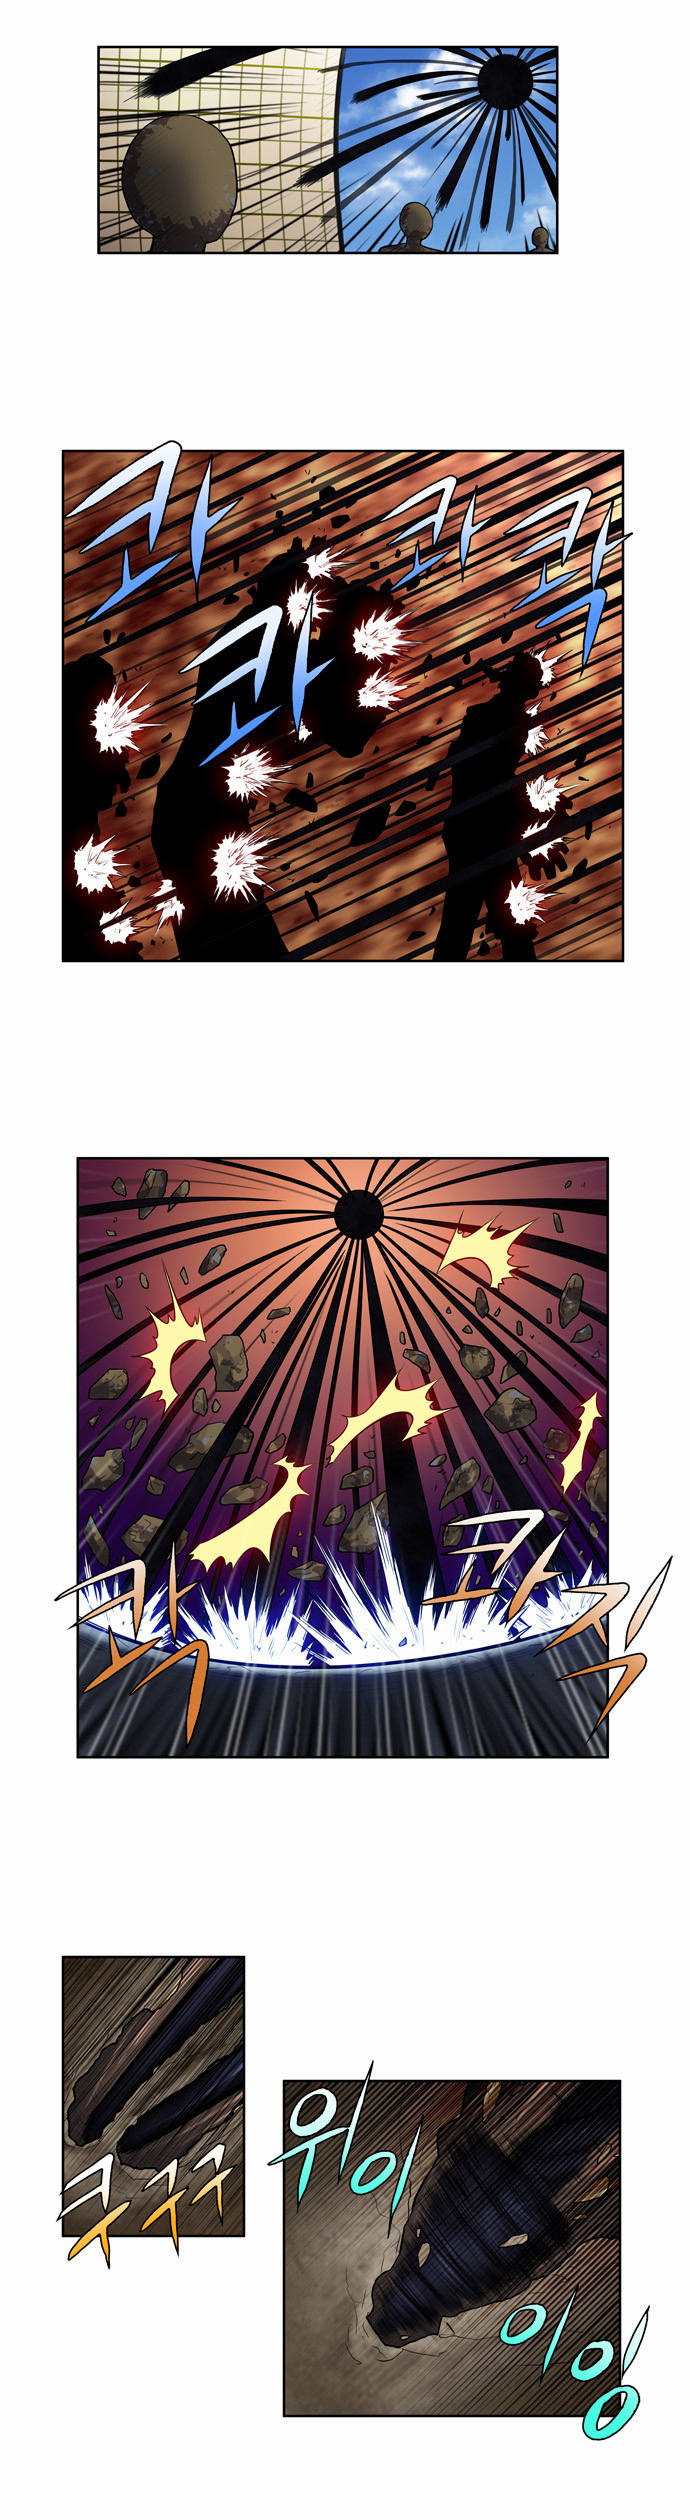 https://c5.ninemanga.com/es_manga/61/1725/439980/681ce394095ac91a7fa9cef0e0d47c16.jpg Page 10